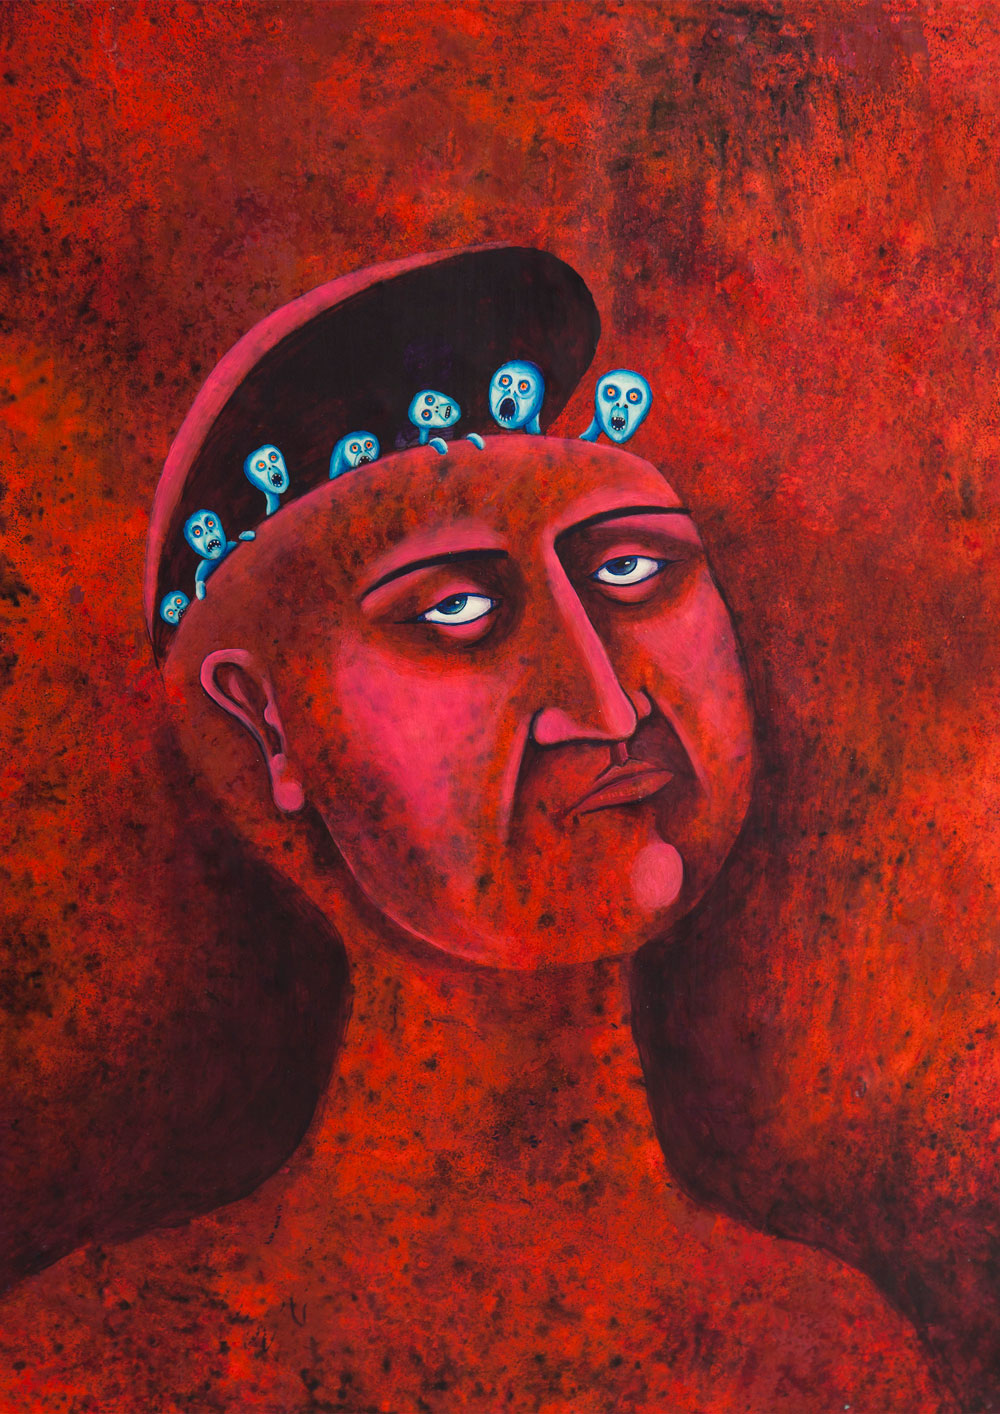 untitled - artwork by salvador carabante